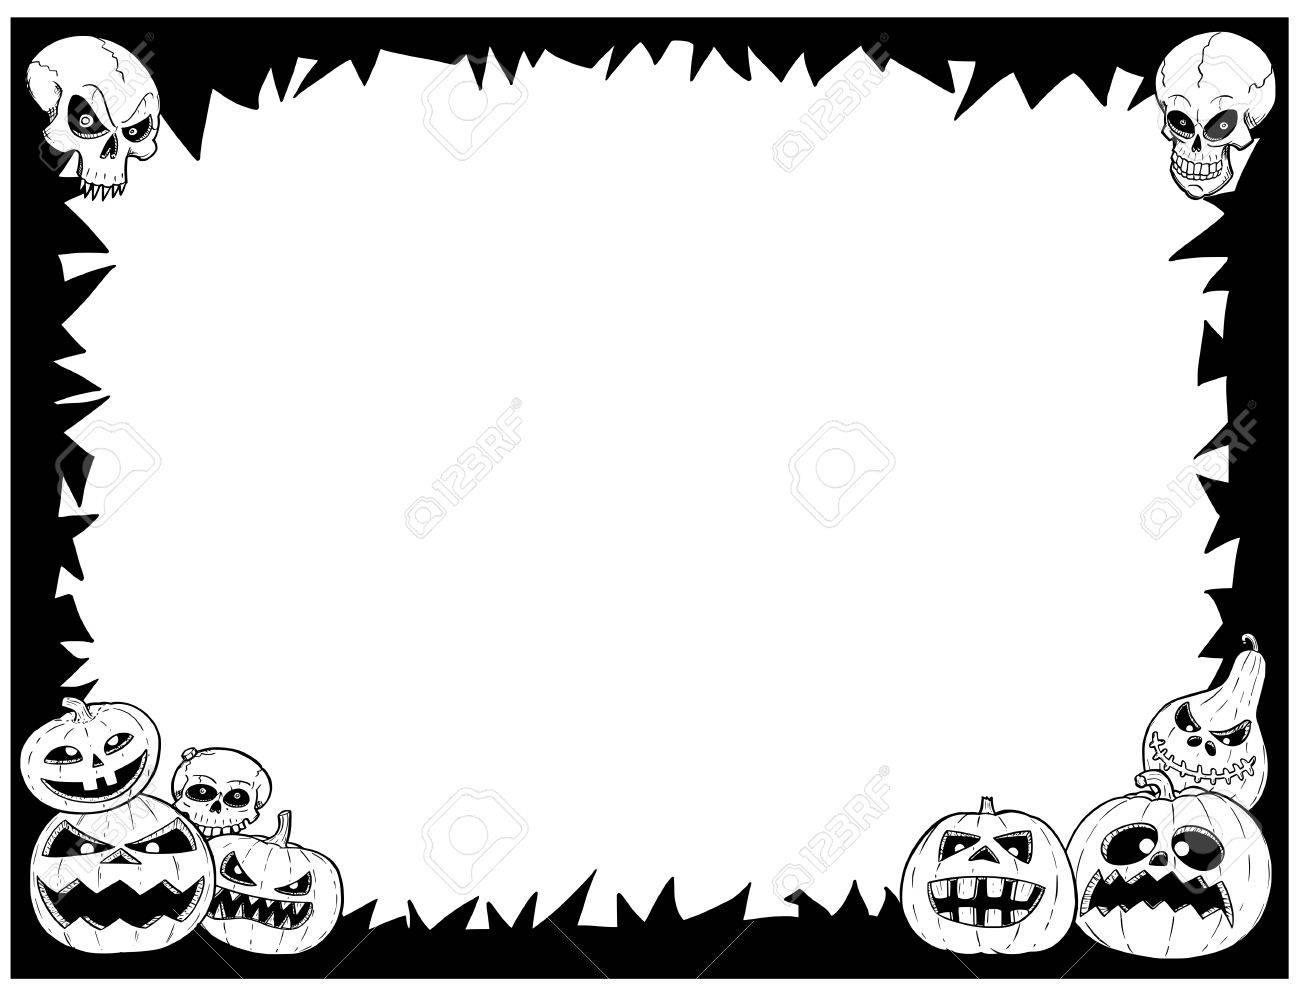 Hand Drawing Cartoon Halloween Frame With Skull And Pumpkin ...